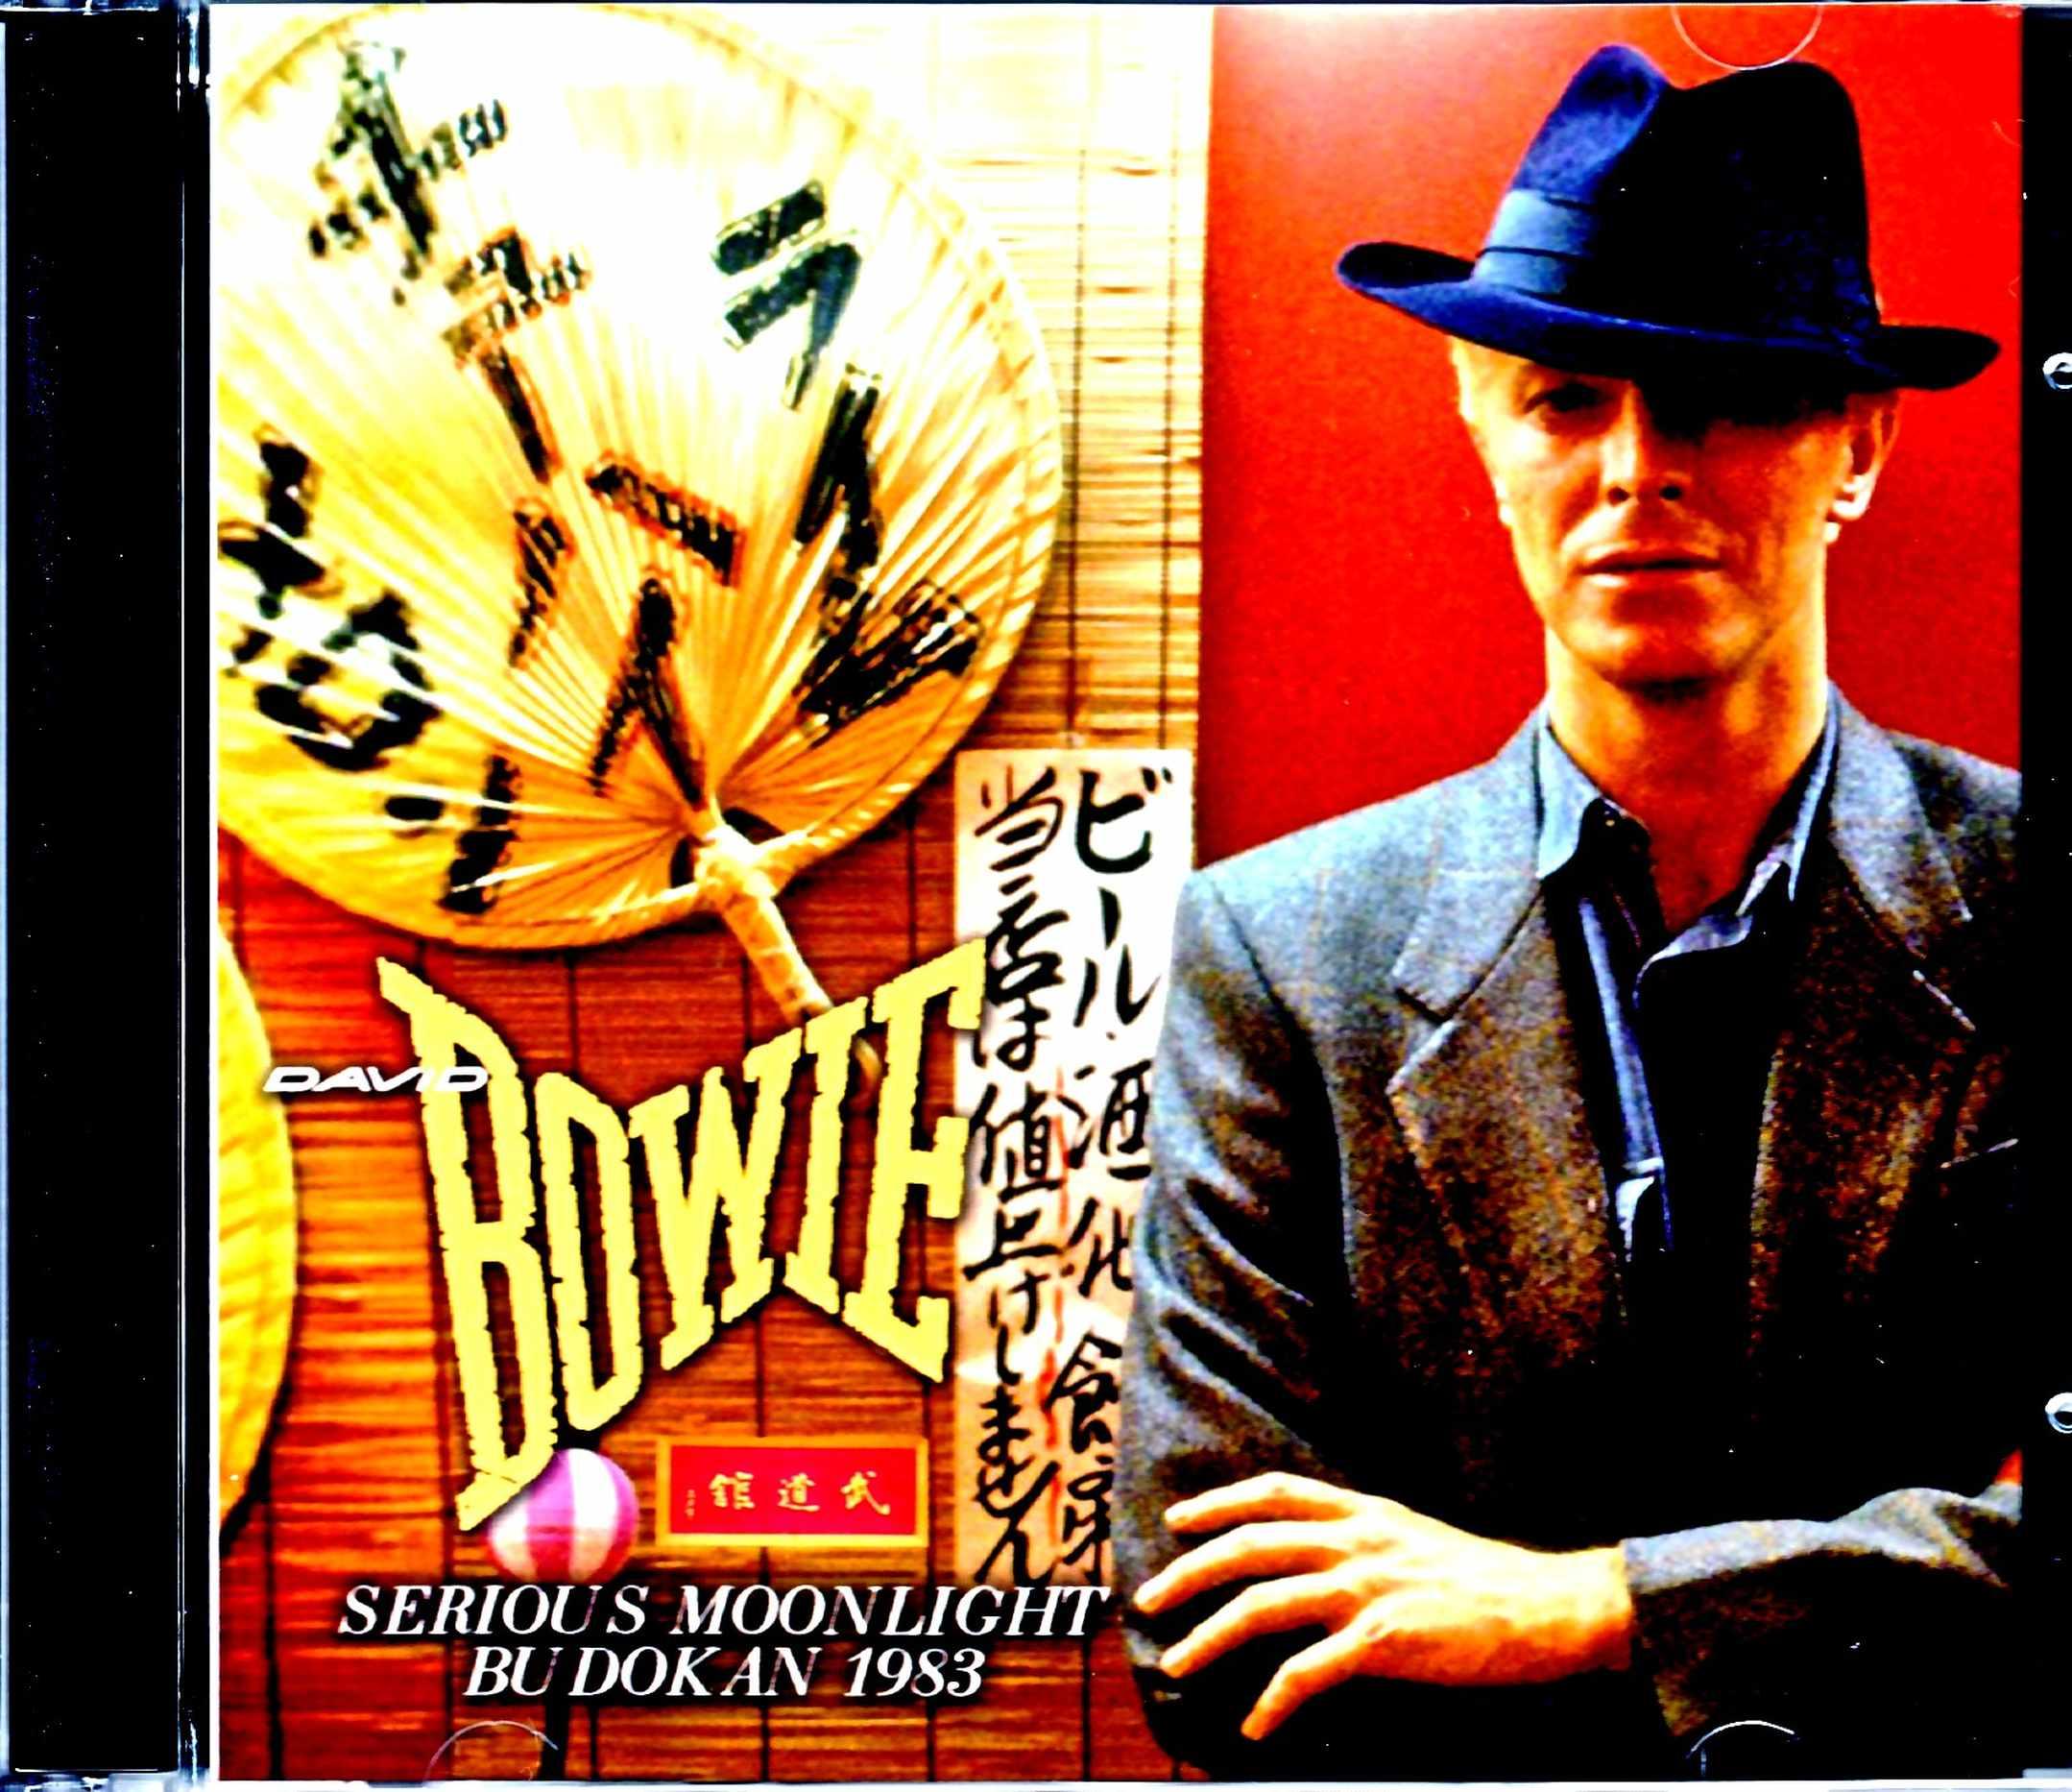 David Bowie デビッド・ボウイ/東京武道館連続公演最終日 1983年 完全版 Tokyo,Japan 10.24.1983 Complete